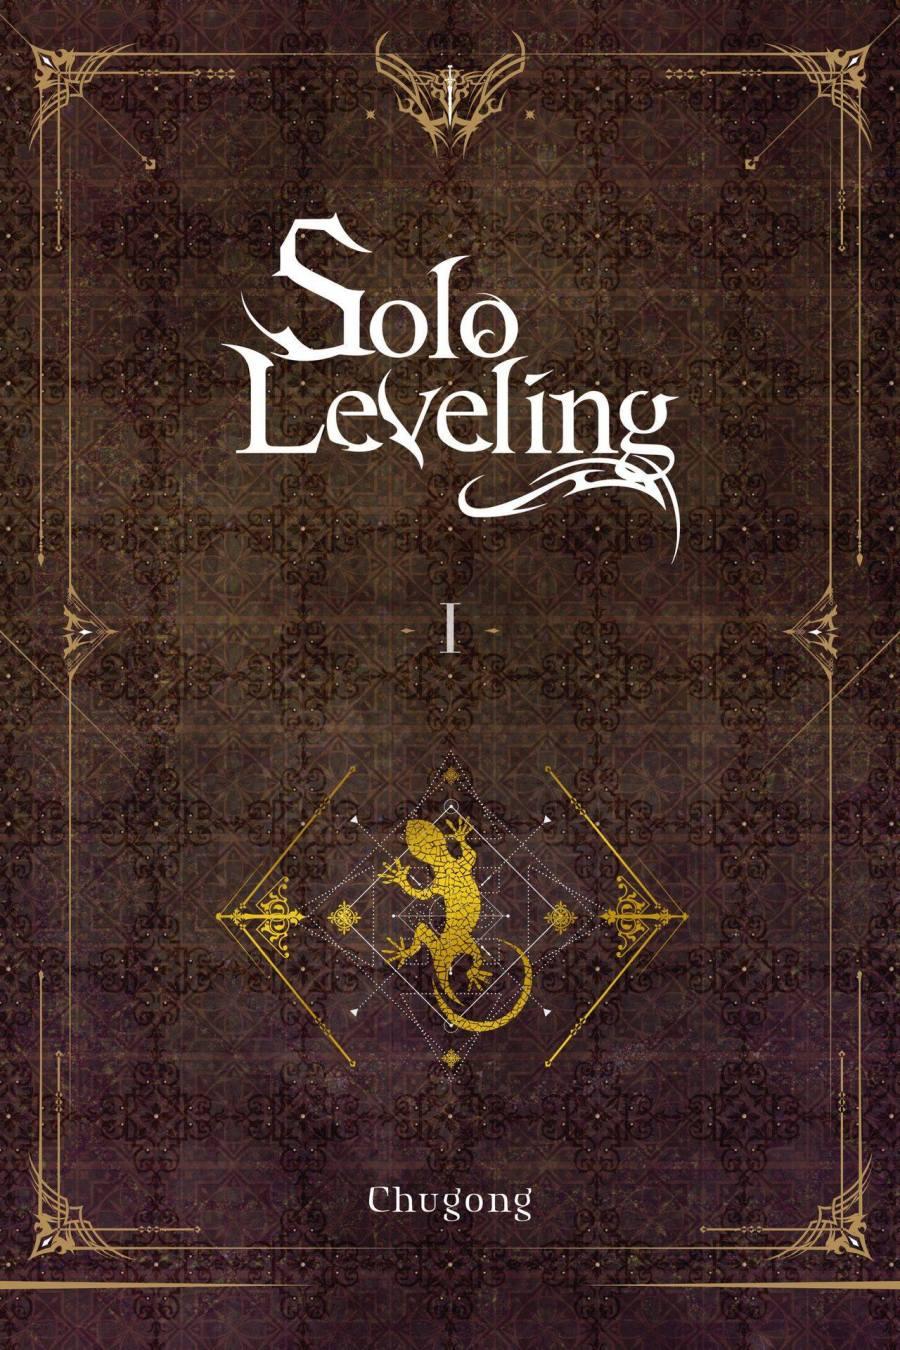 Solo Leveling Volume 1